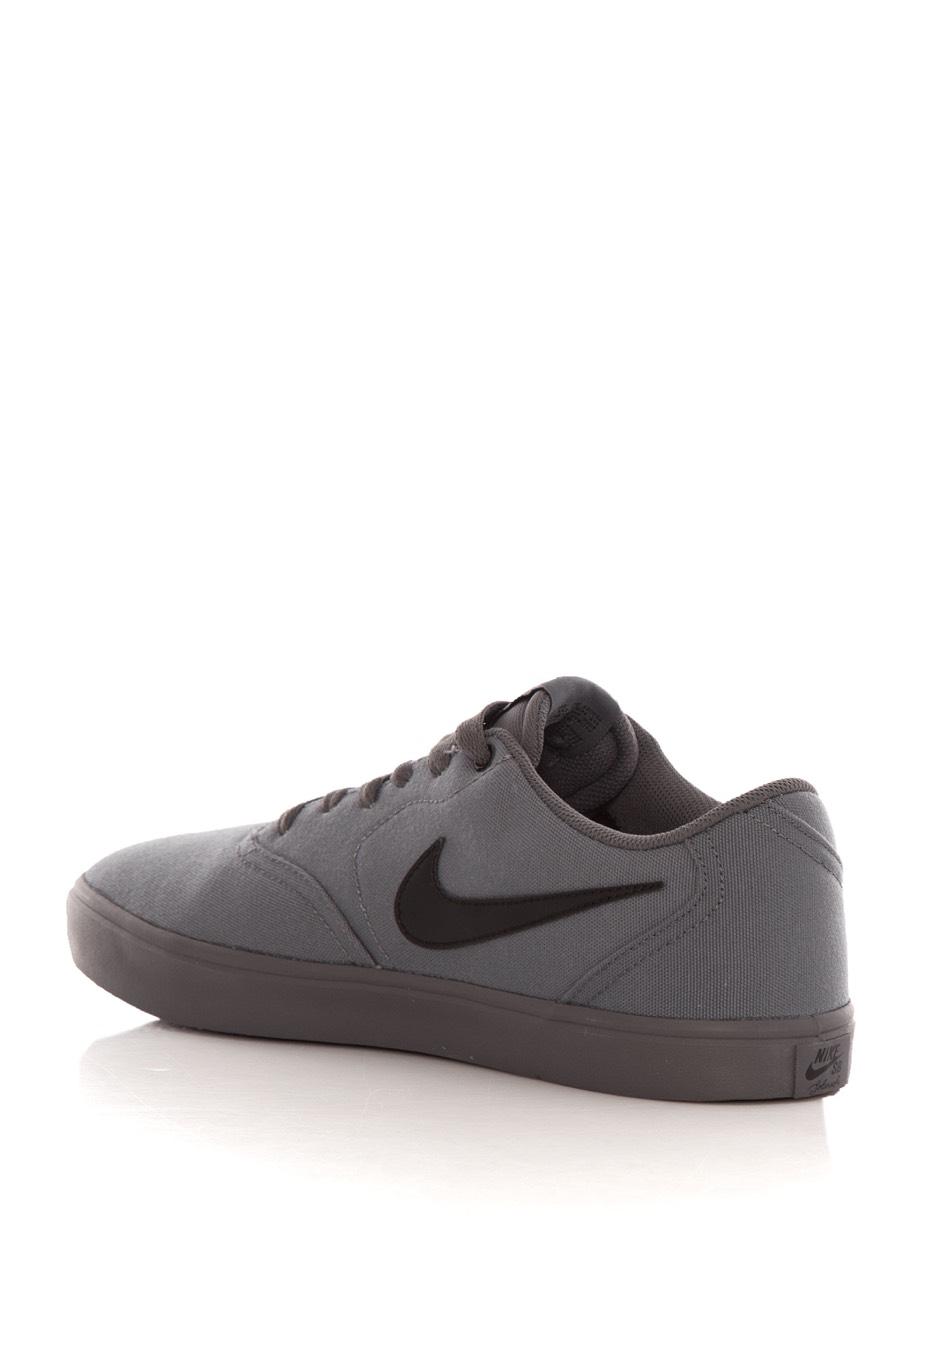 c7cebf703b ... alle schuhe zoom stefan janoski black white vorderansicht d32ba efd4b   promo code nike sb check solarsoft canvas dark grey black shoes 9e030 55c9e